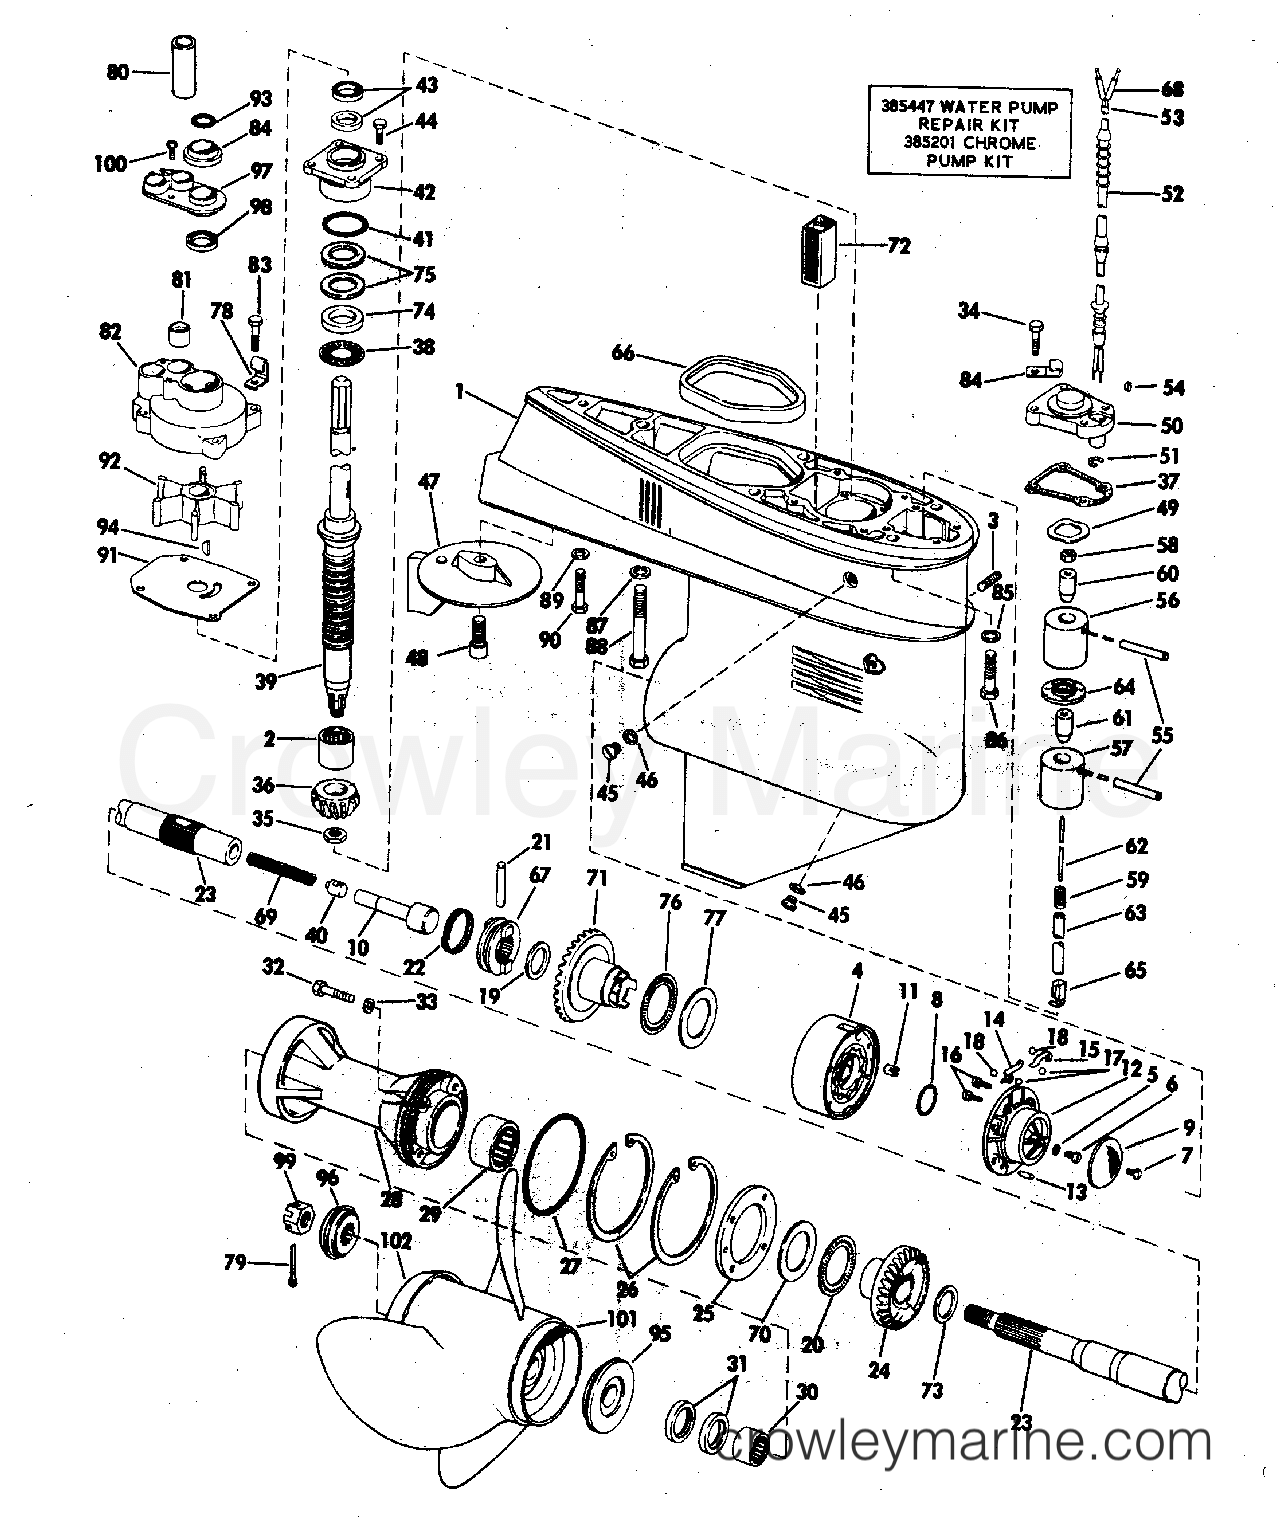 gearcase 1972 evinrude outboards 65 65272s crowley marine. Black Bedroom Furniture Sets. Home Design Ideas